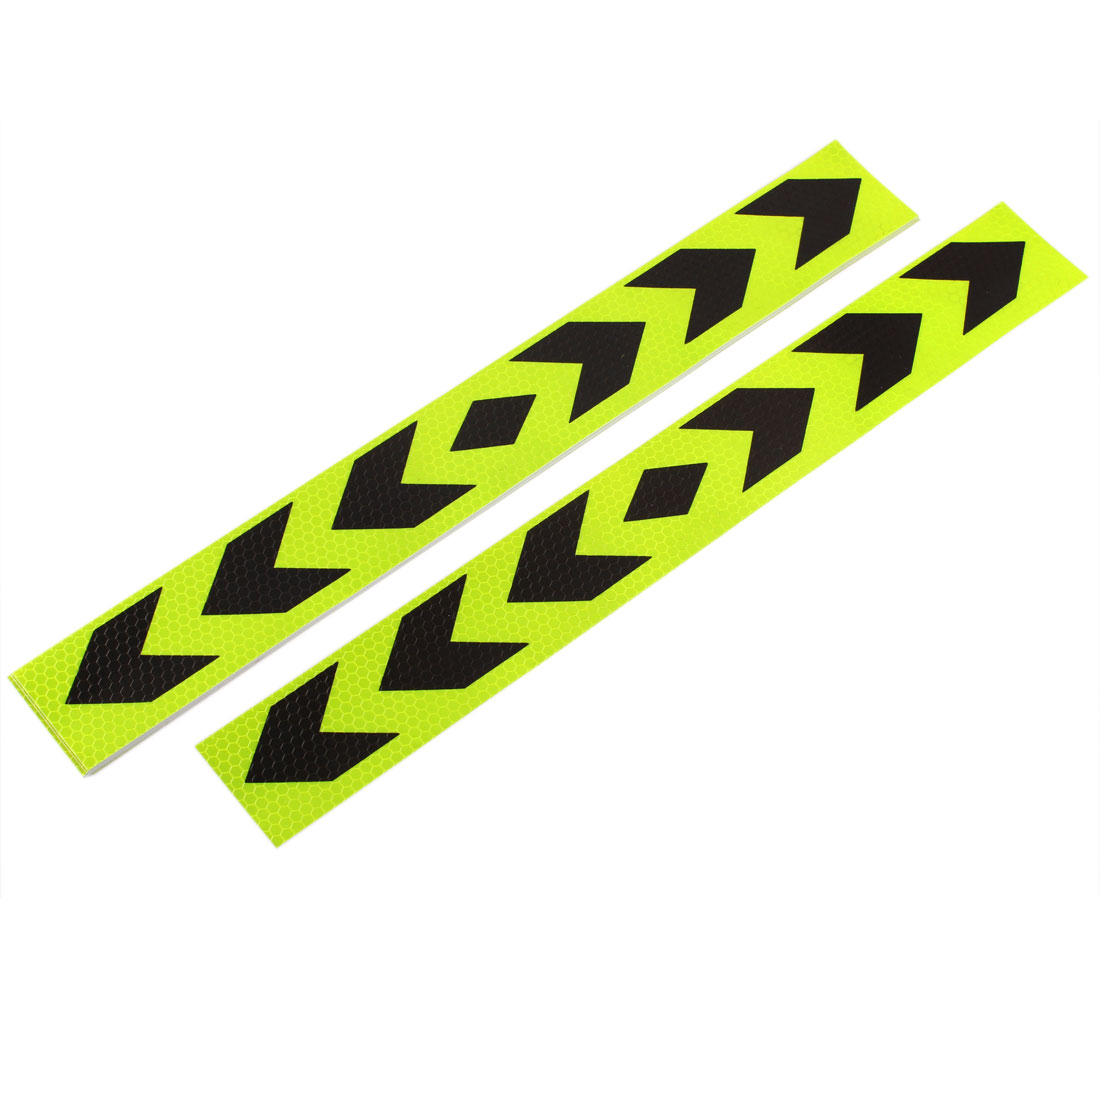 10 Pcs Shiny Yellow Black Plastic Arrow Print Reflective Sticker for Car